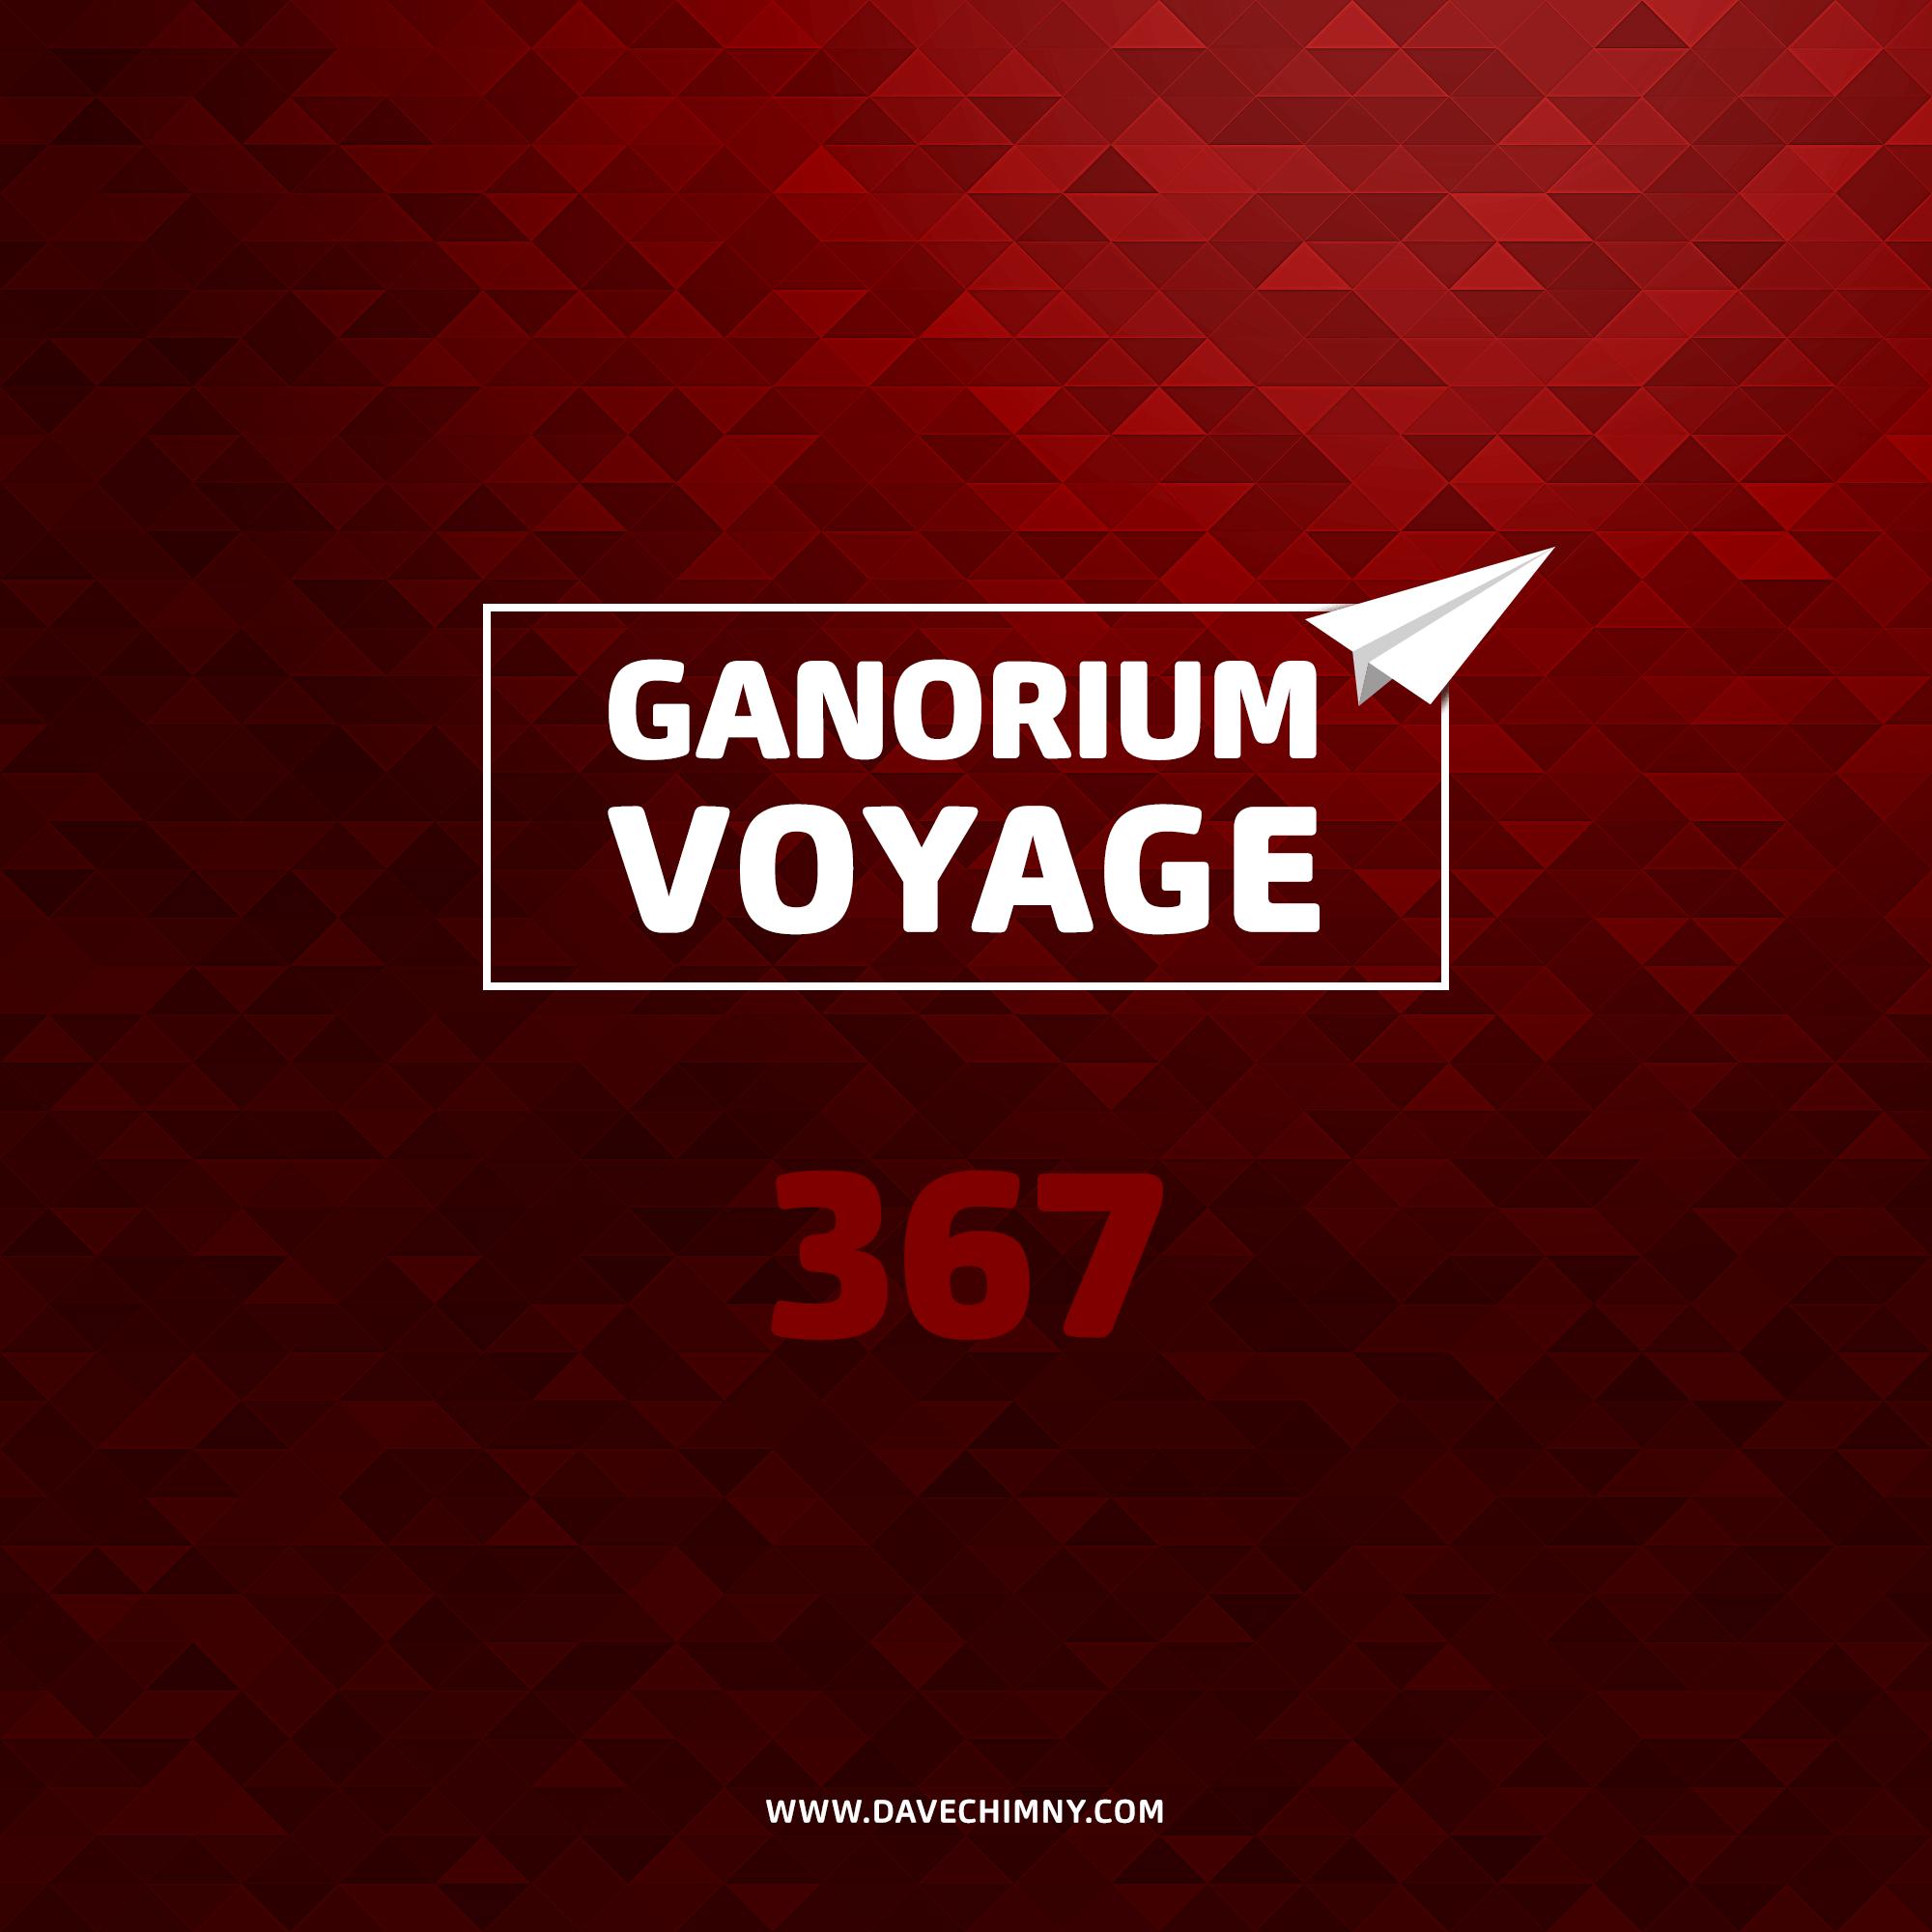 Dave Chimny – Ganorium Voyage 367